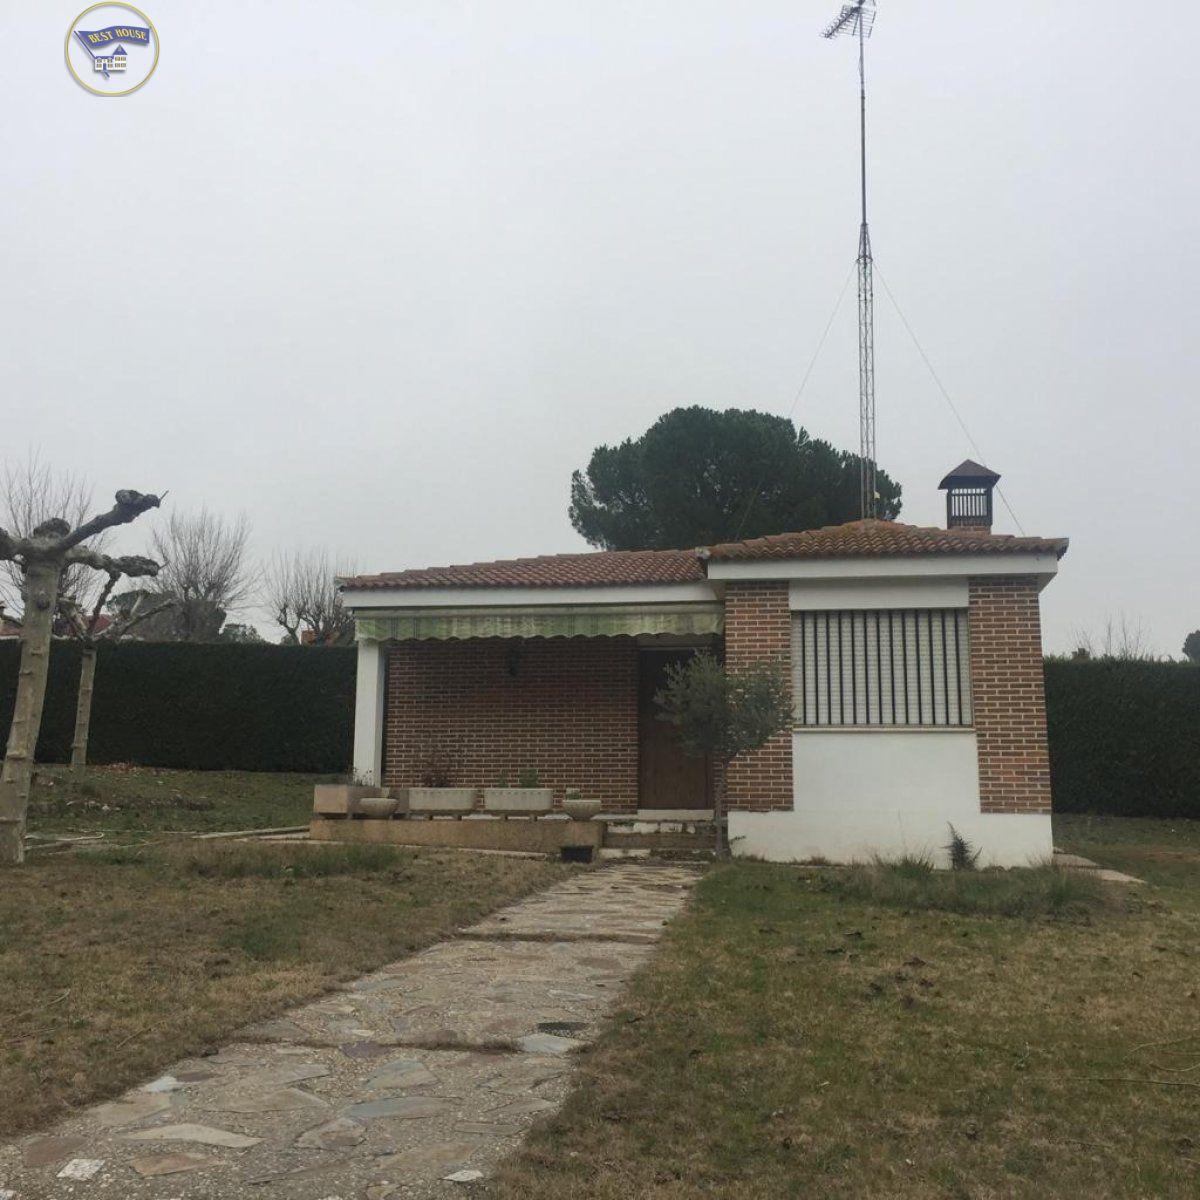 Parcela rústica en venta en Laguna de Duero